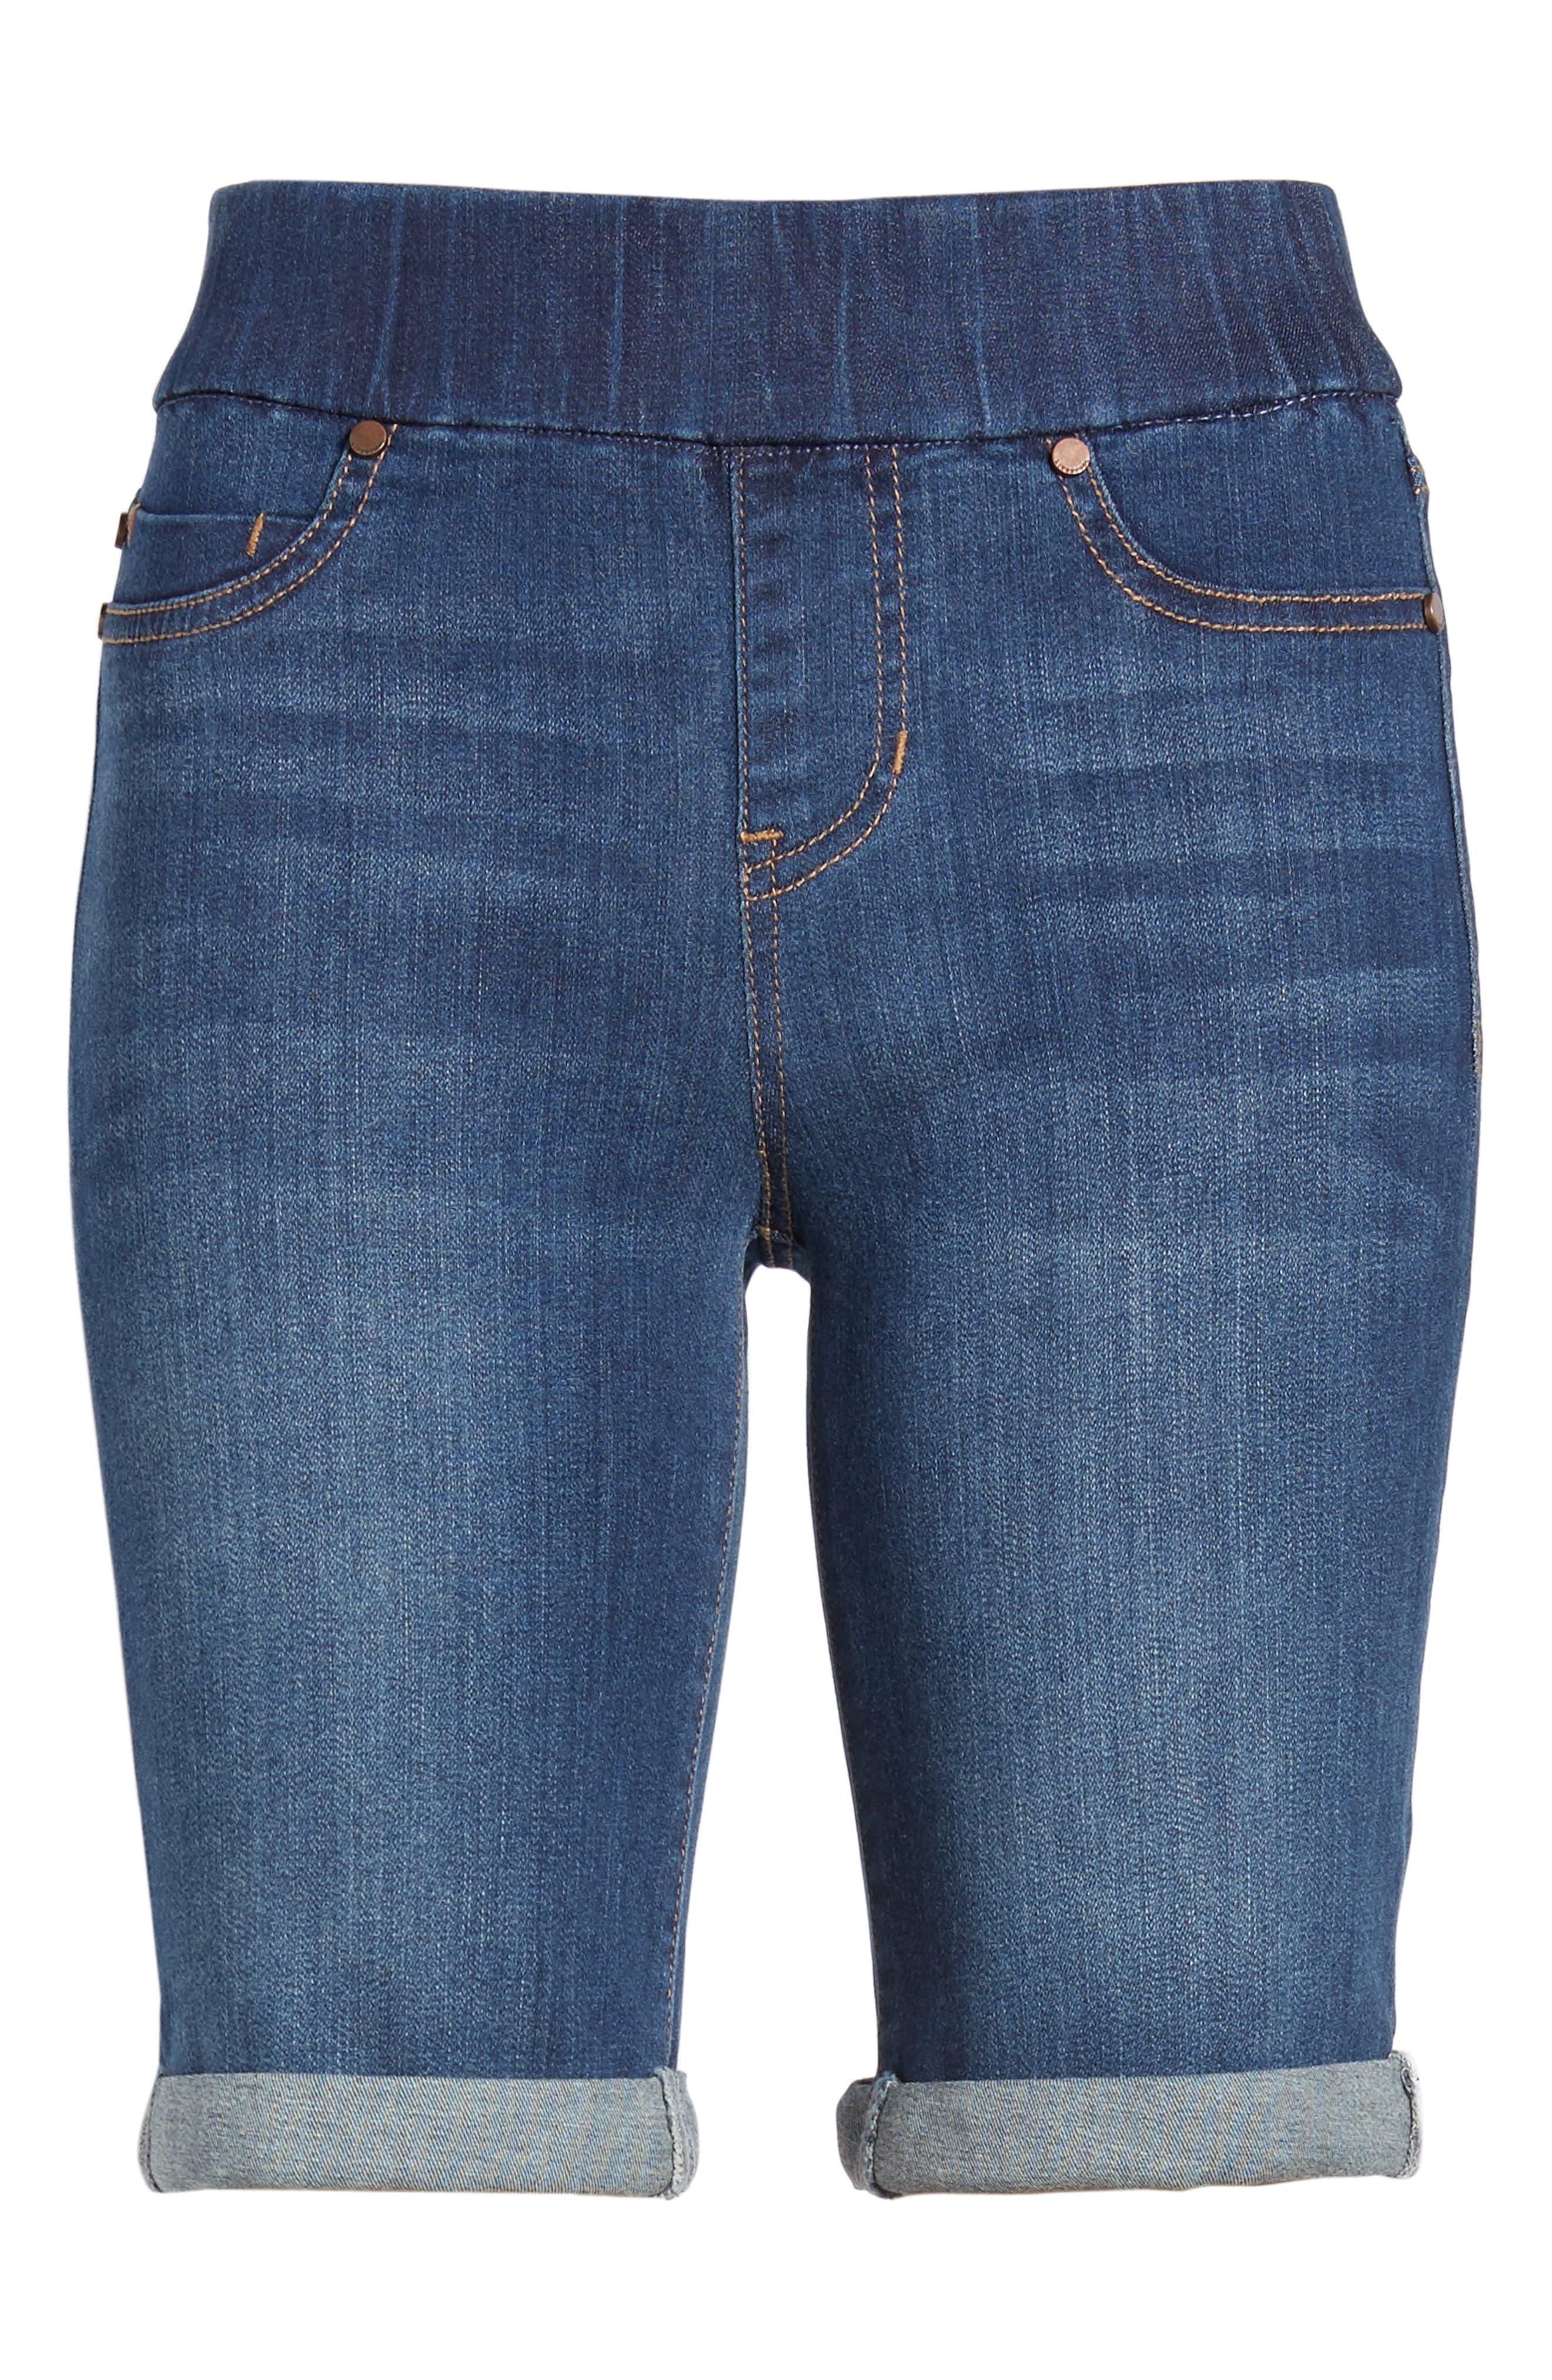 Sienna Pull-On Denim Bermuda Shorts,                             Alternate thumbnail 4, color,                             ELYSIAN DARK